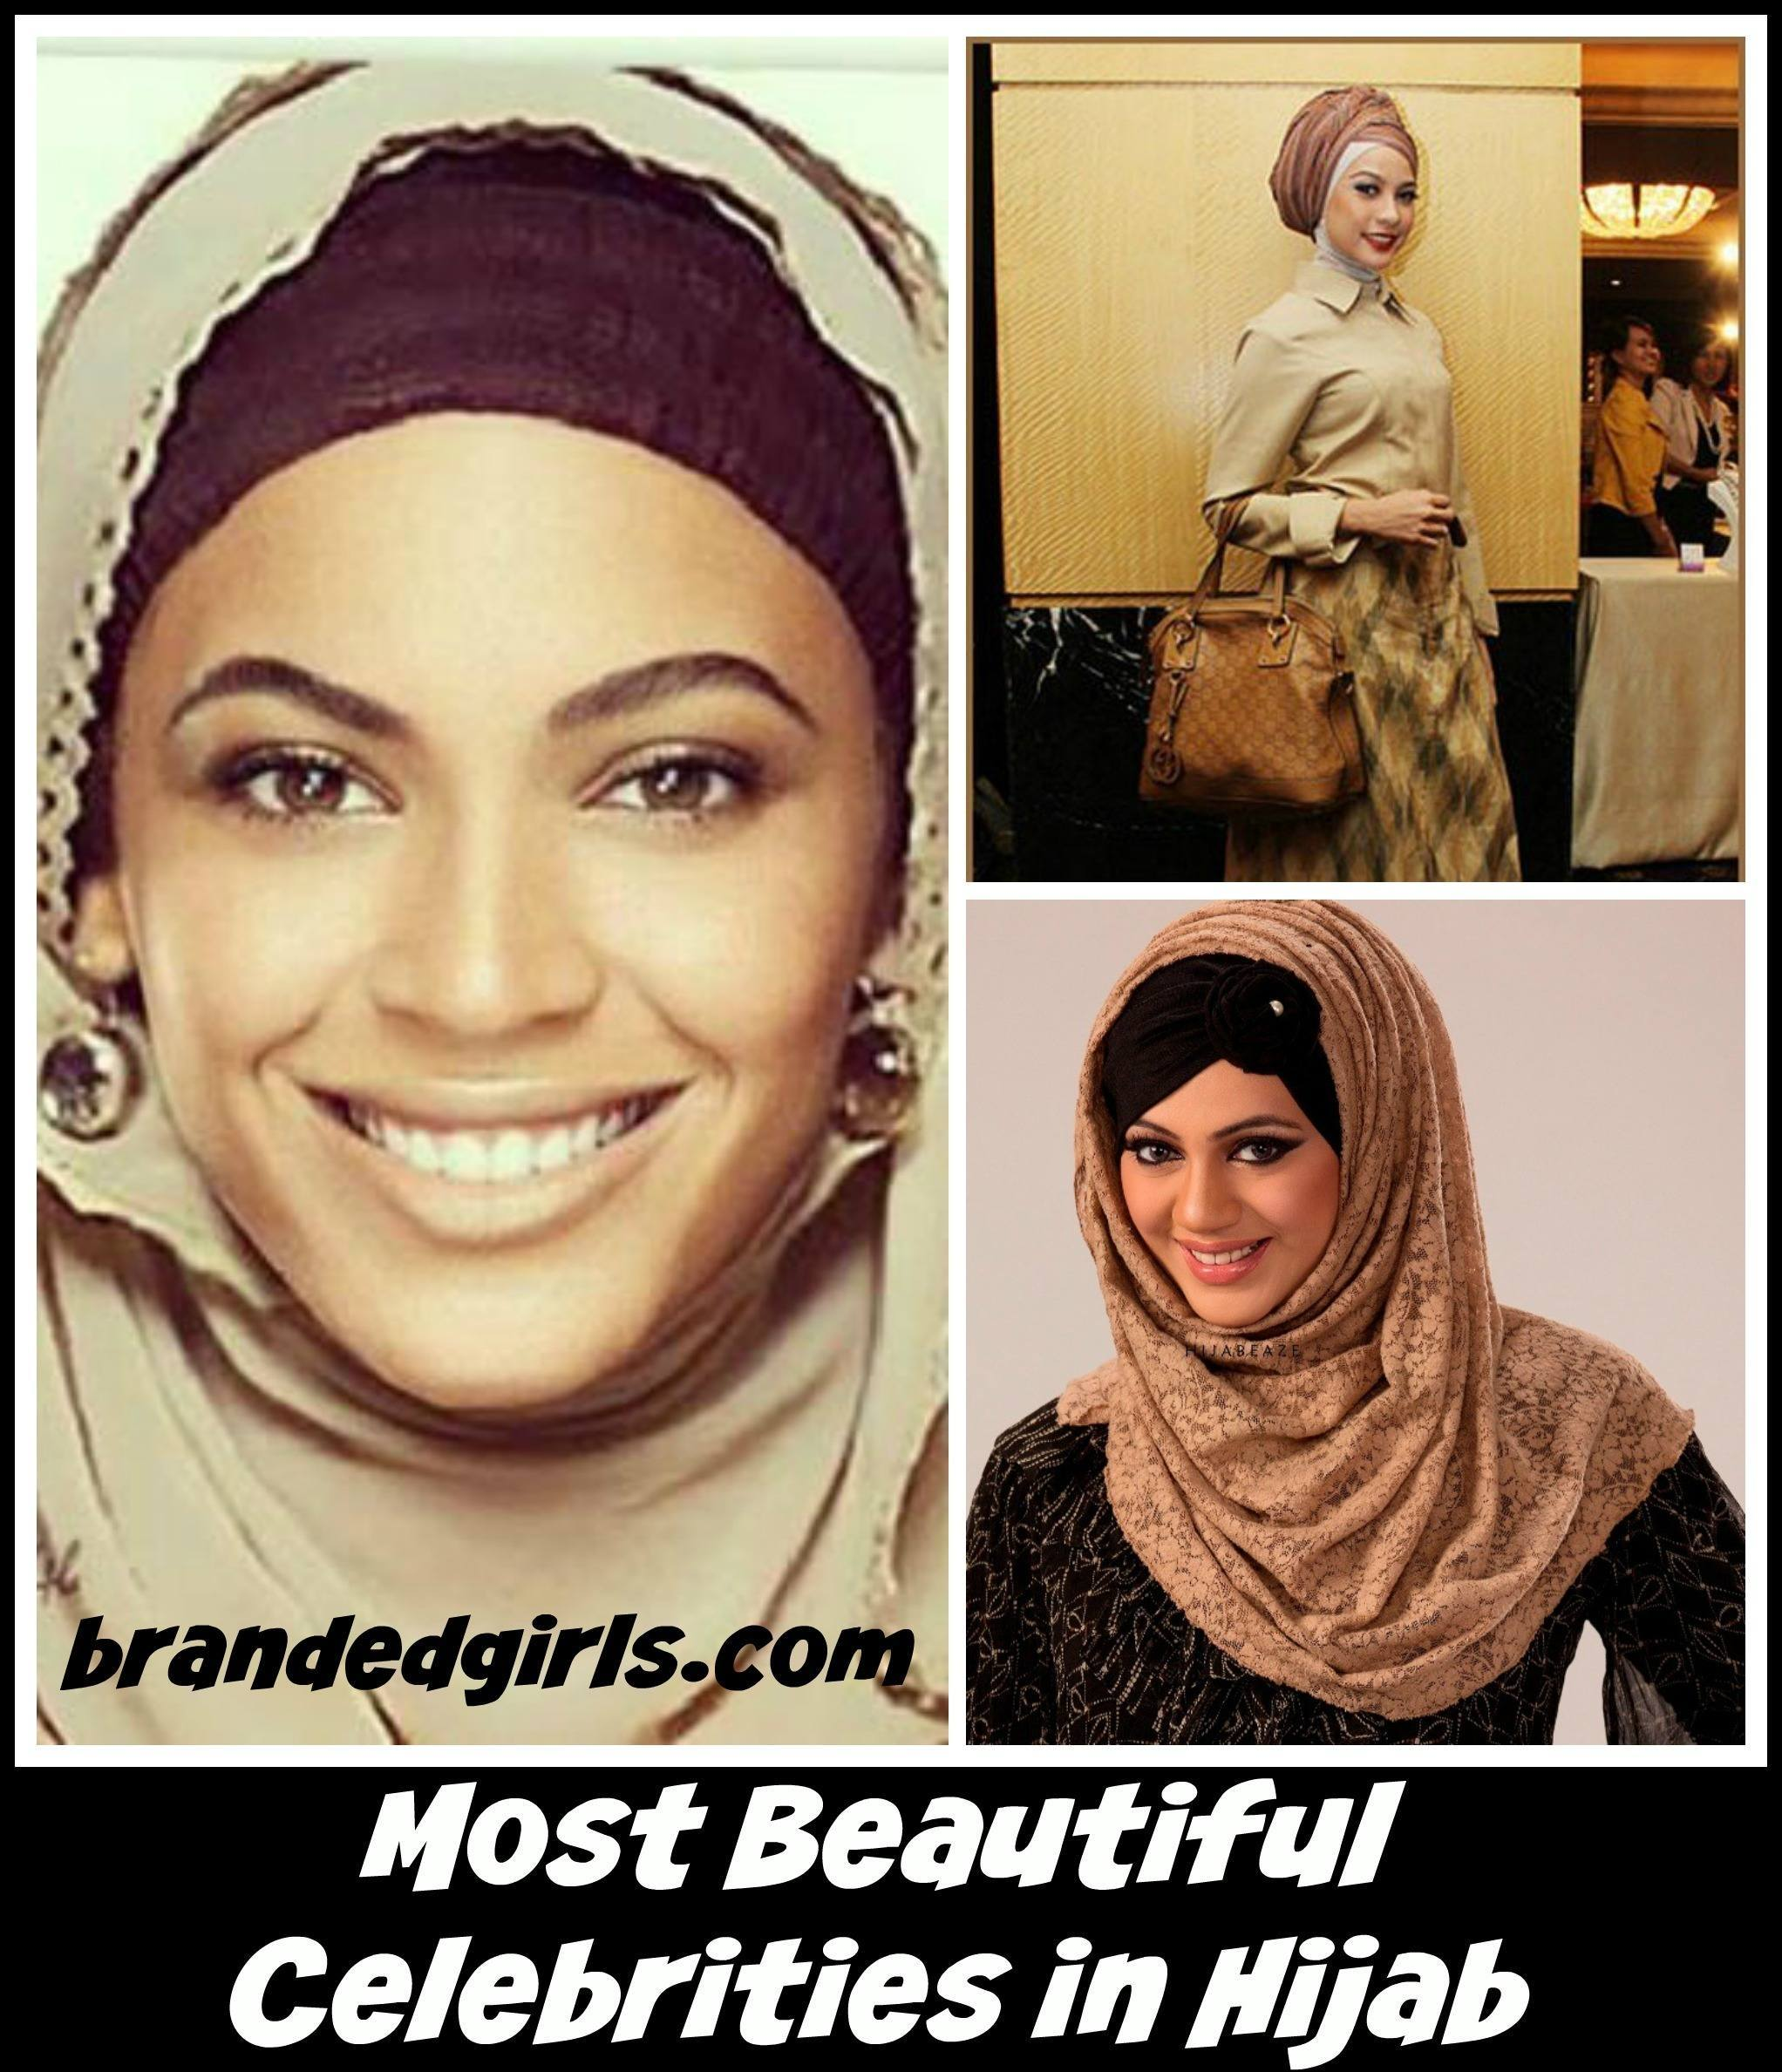 hijab celebrities